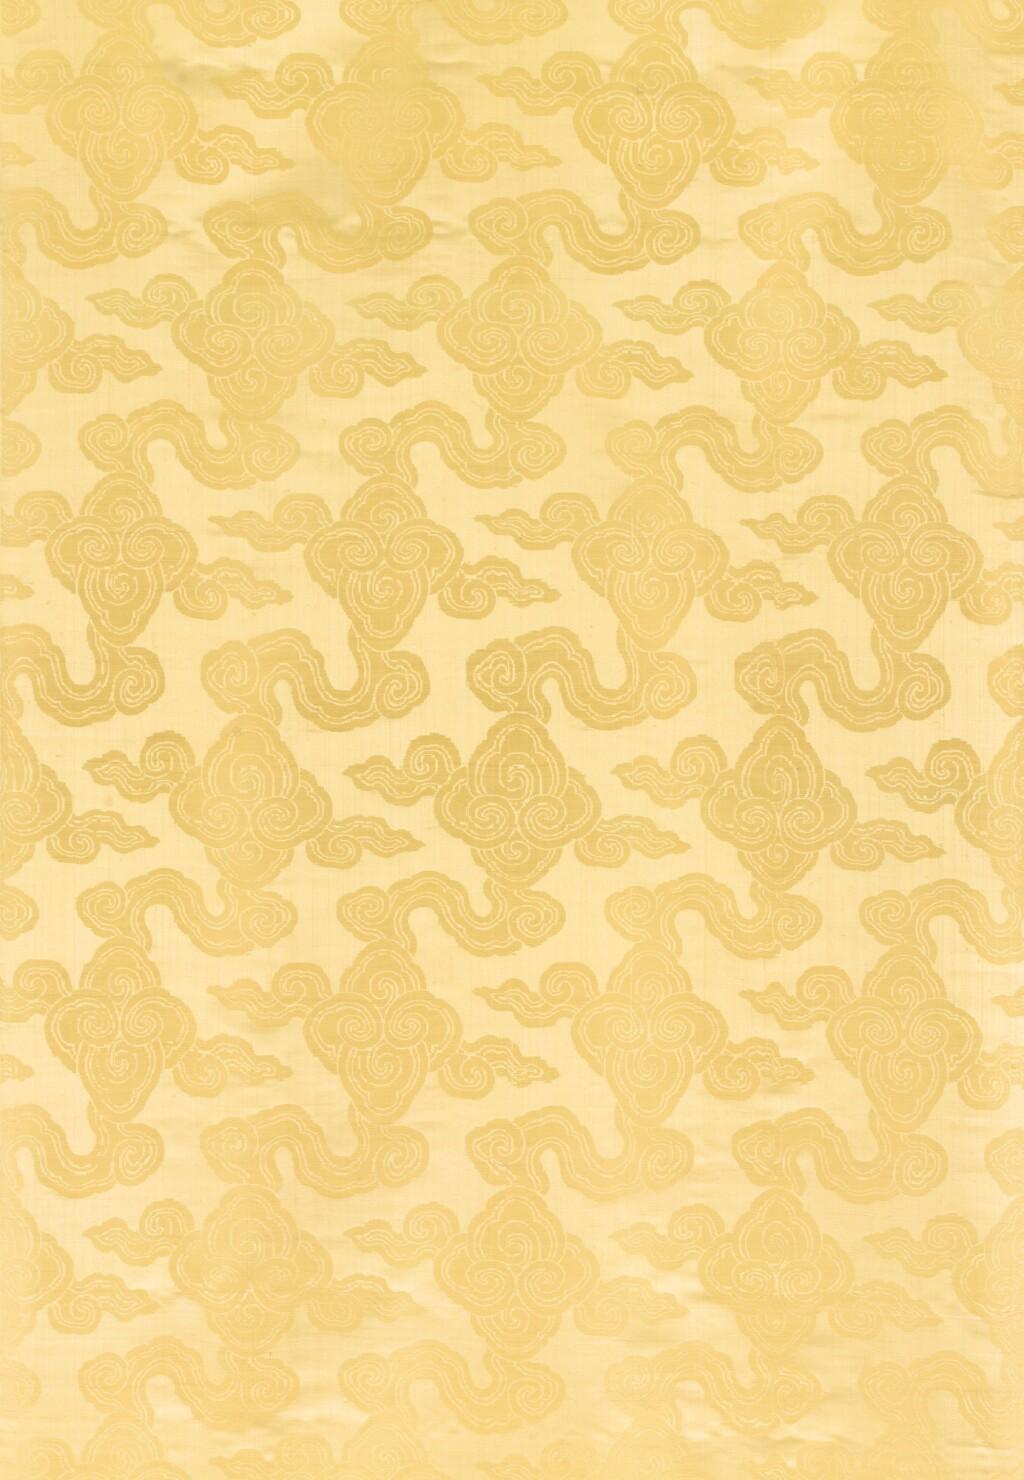 ROULEAU DE TISSU EN SOIE JAUNE  FIN DE LA DYNASTIE QING | 清晚期 黃地綢緞 及 暹邏 十九世紀末至二十世紀初 織錦 各一匹 | A bolt of yellow silk brocade, late Qing Dynasty